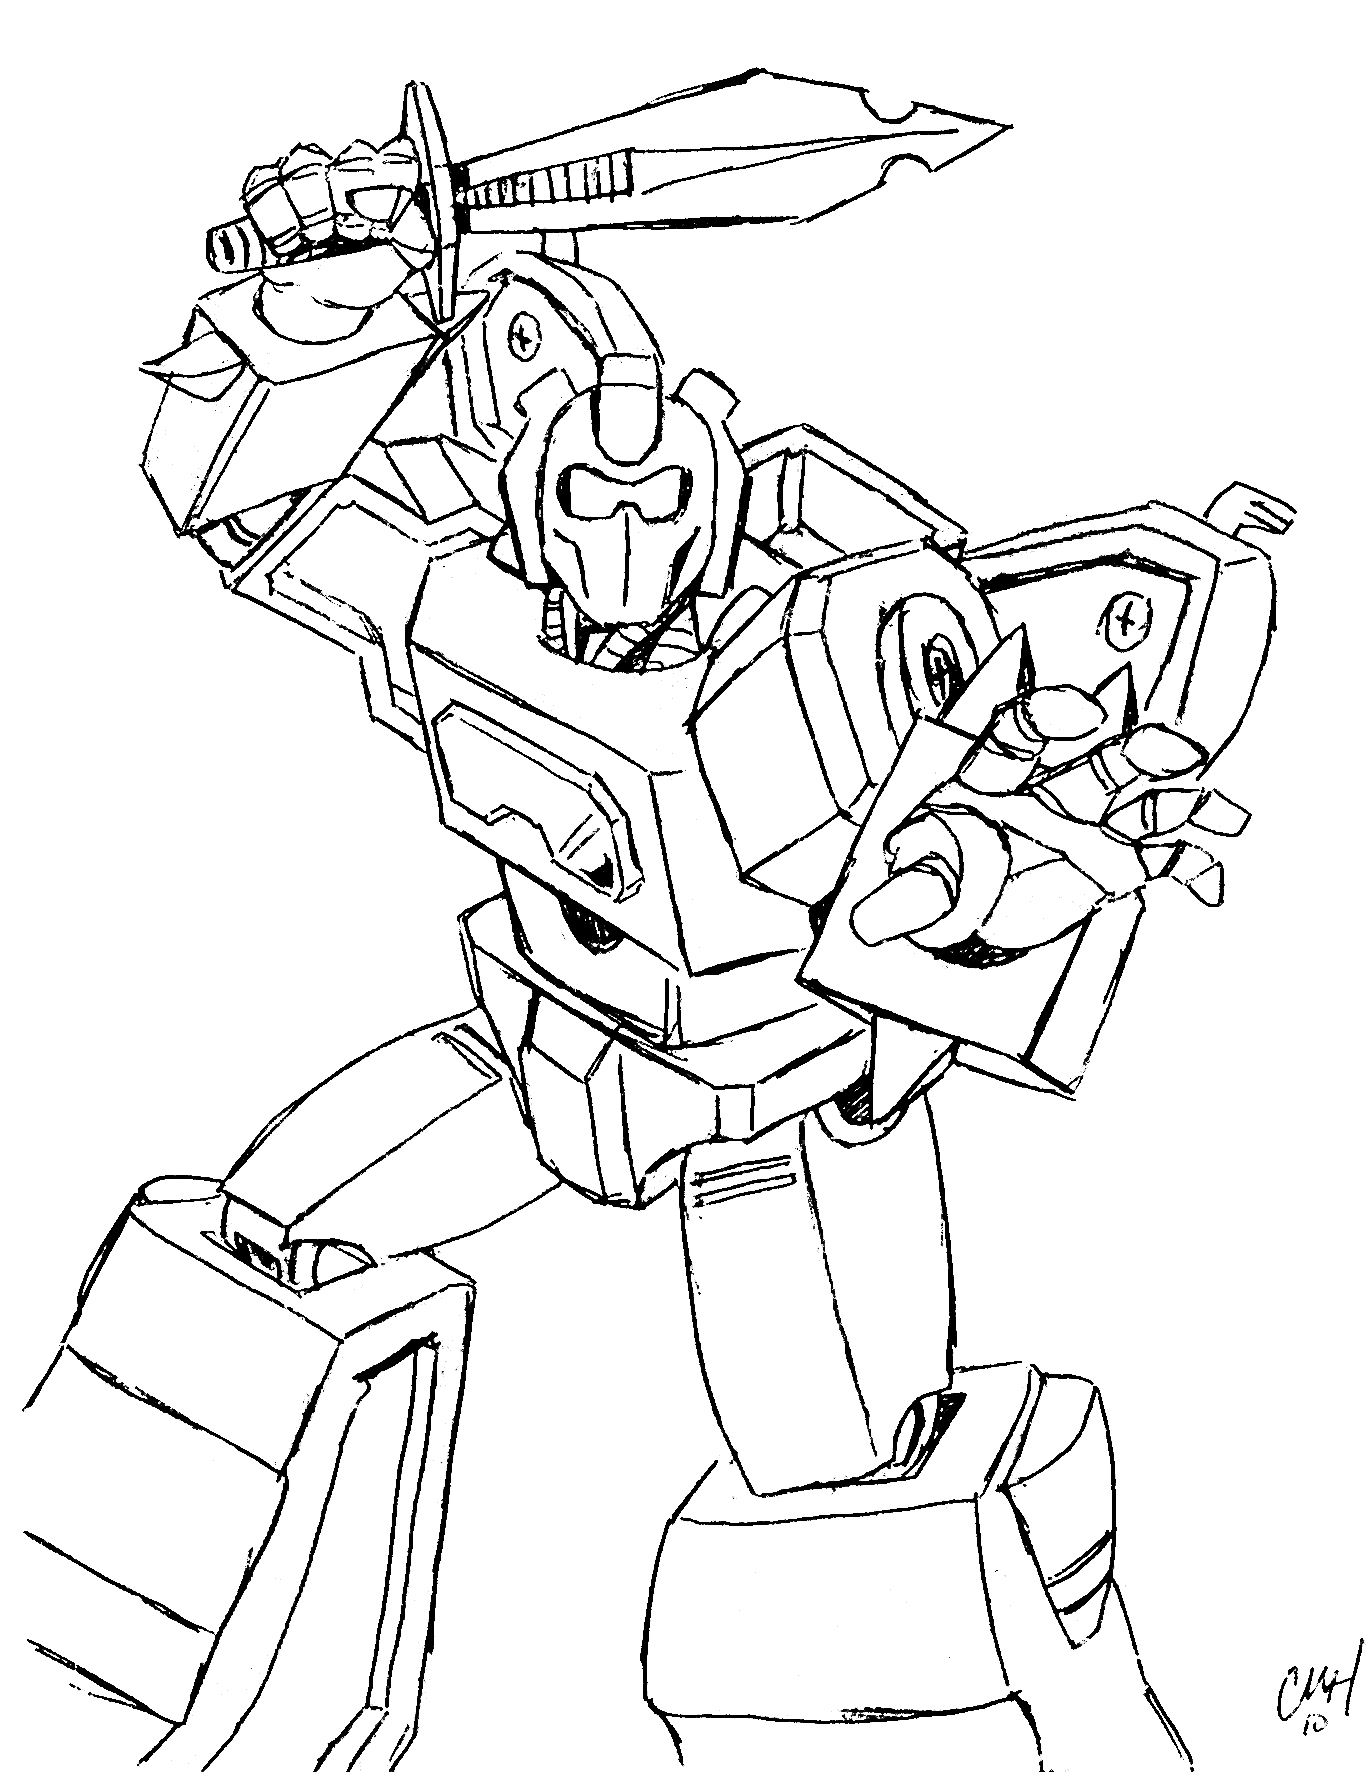 transformers coloring transformers coloring pages coloring pages to print transformers coloring